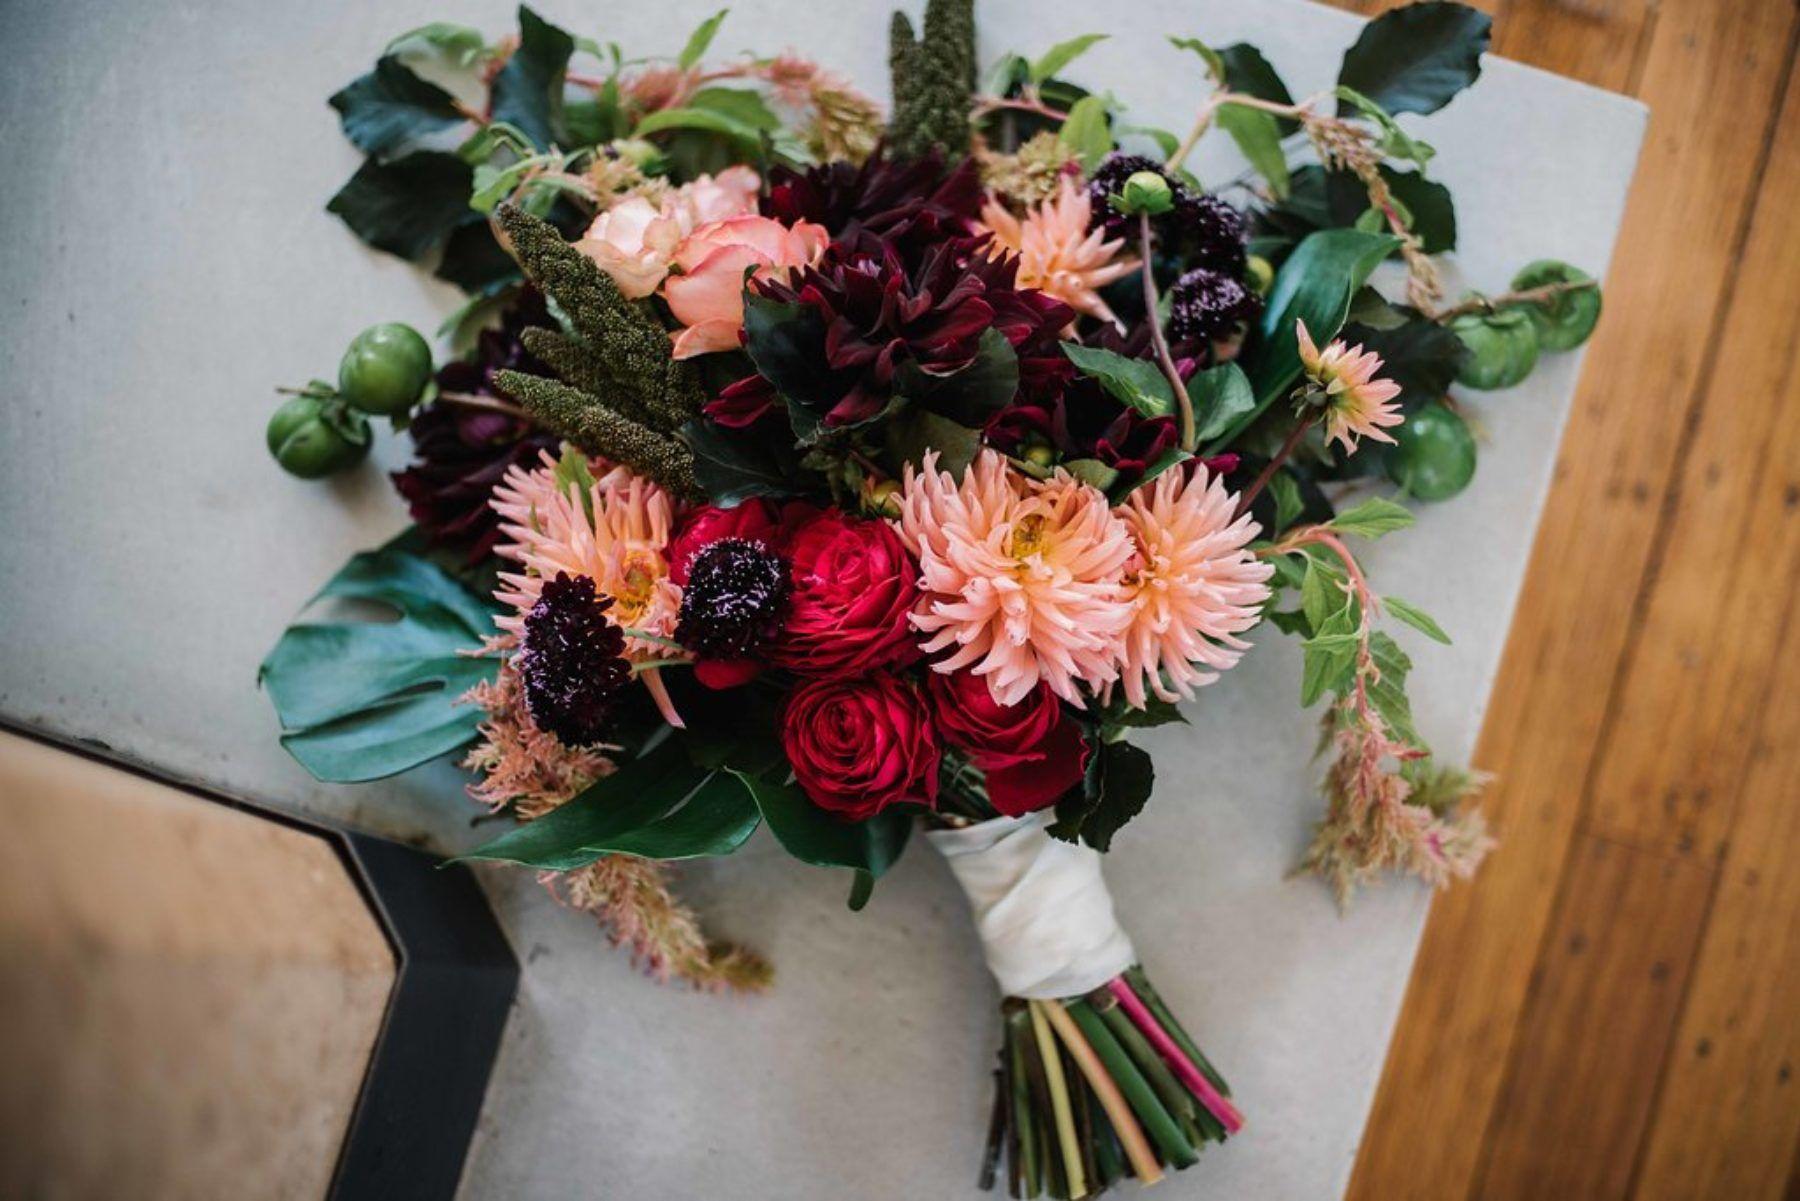 Amy's wedding dress  Giles u Amyus Glam Echuca Wedding  Bridal bouquets Florists and